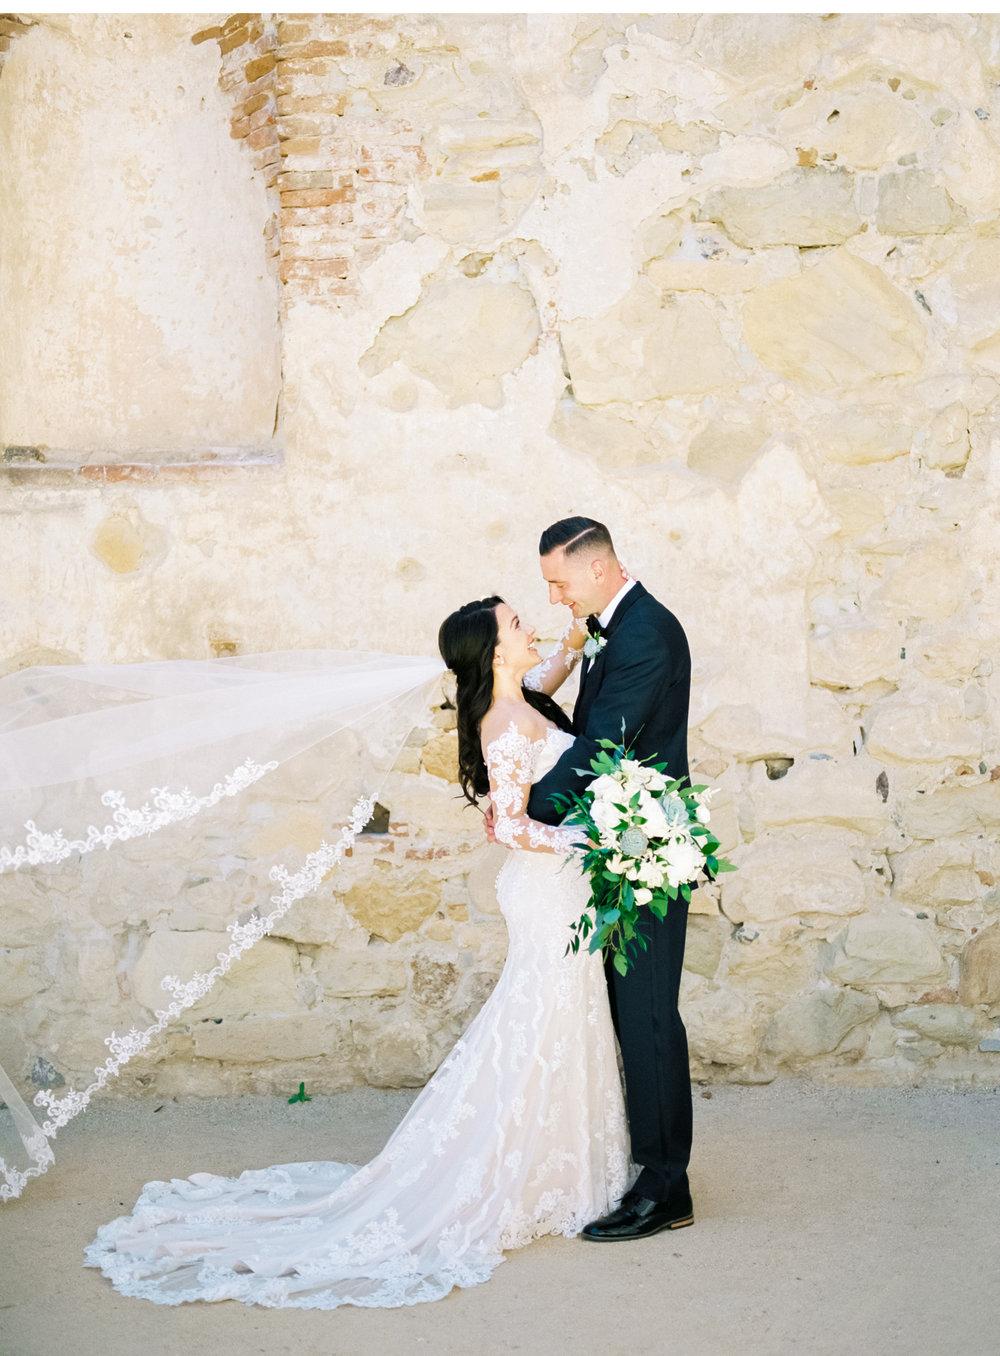 Southern-California-Weddings-Natalie-Schutt-Photography-Weddings_07.jpg